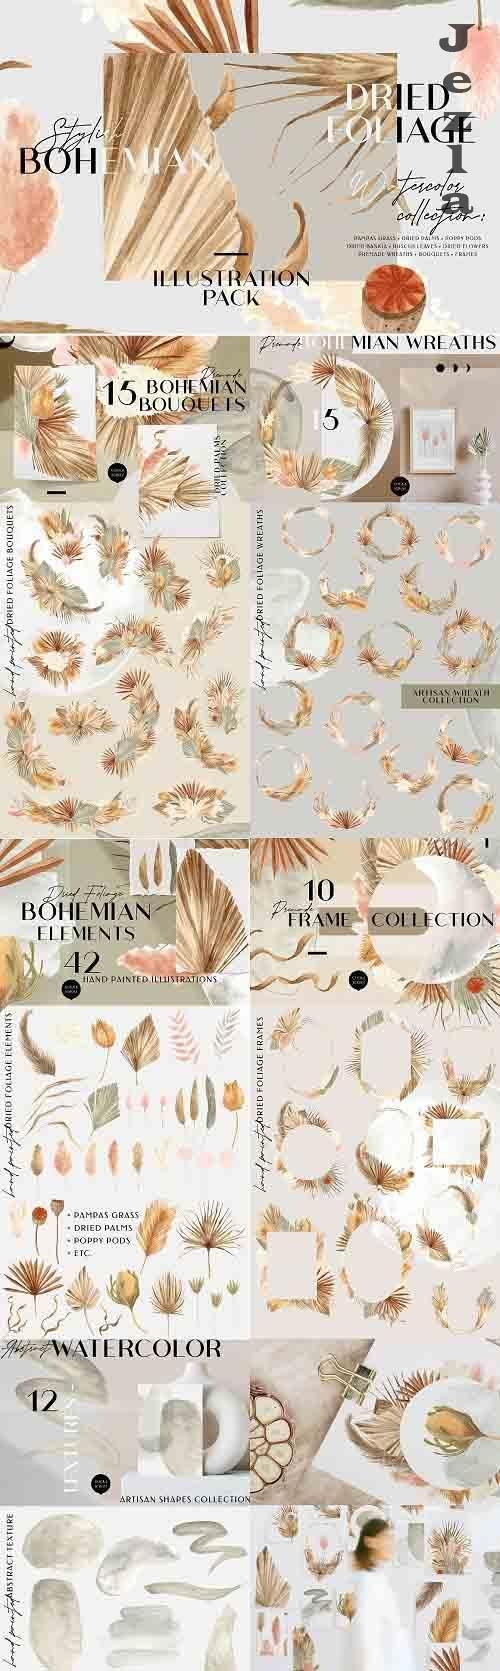 Bohemian Dried Foliage Illustration - 5185197